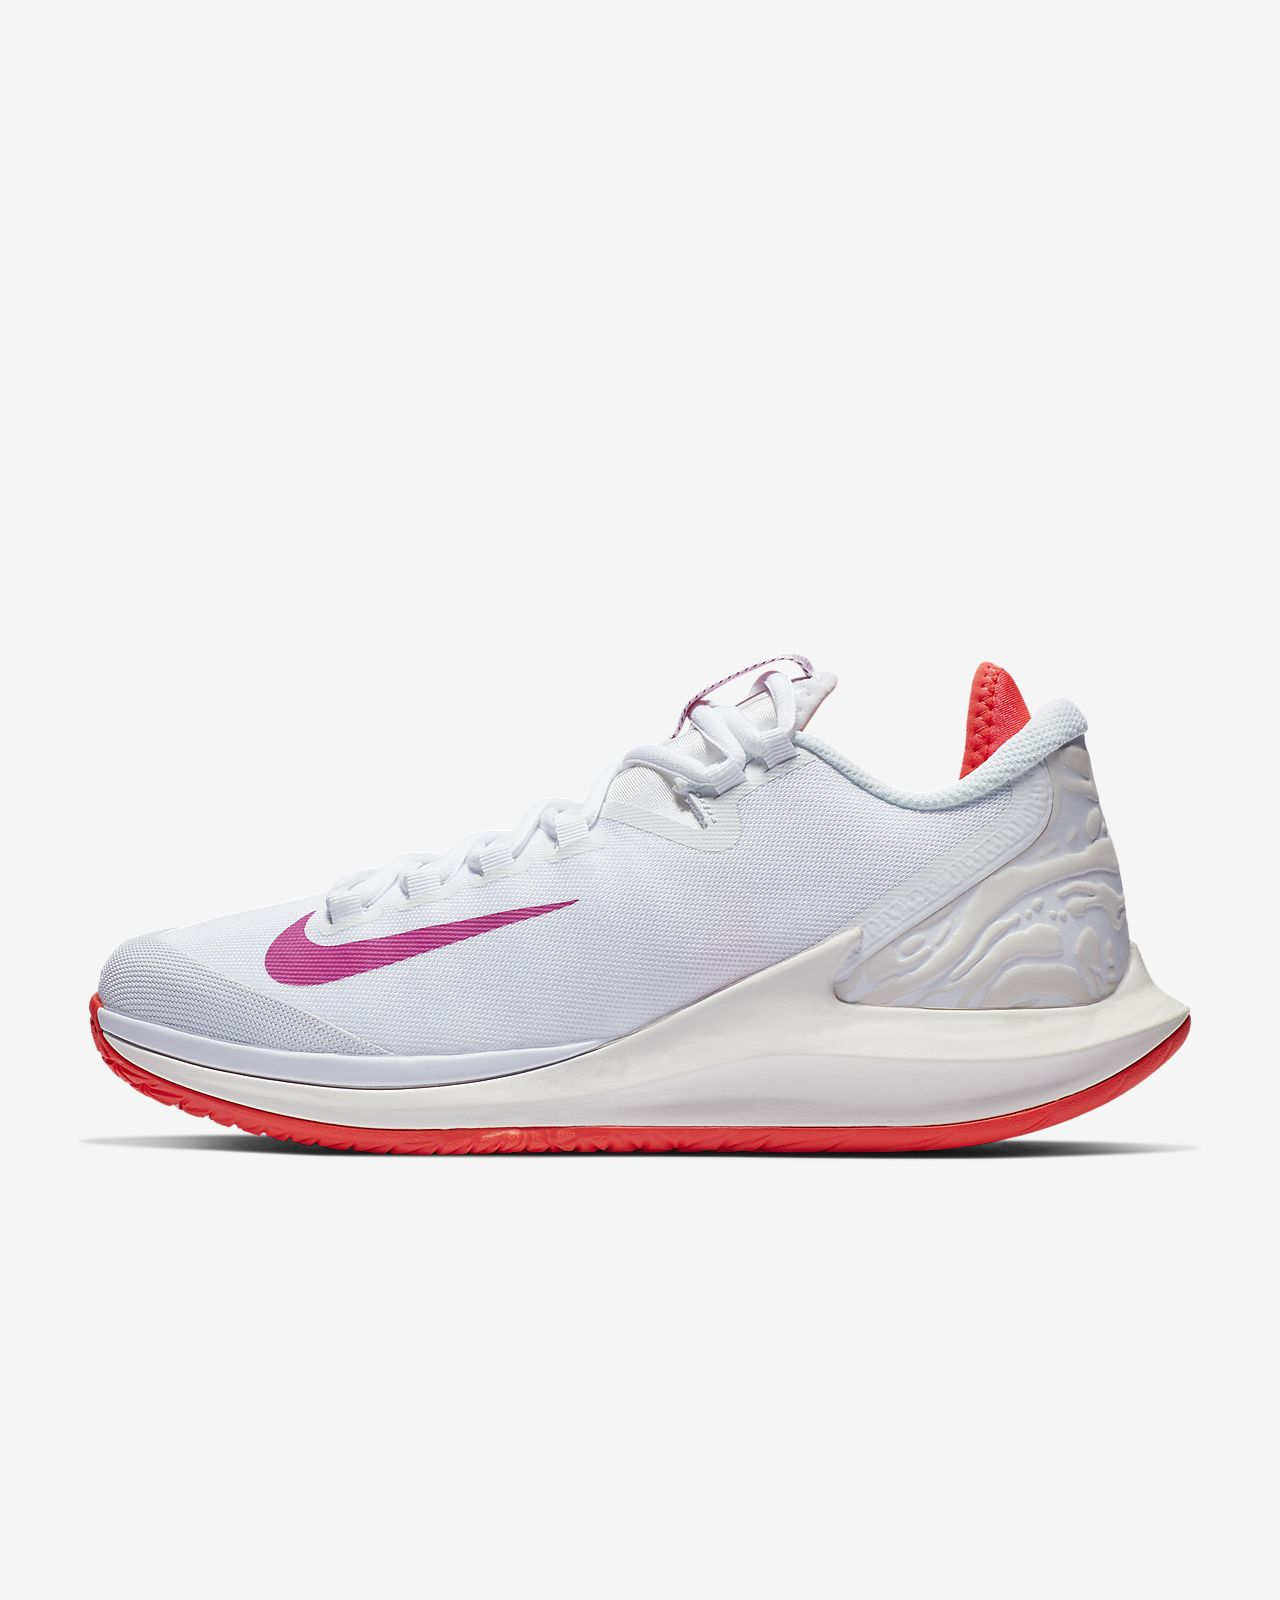 NikeCourt Air Zoom Zero-tennissko til kvinder